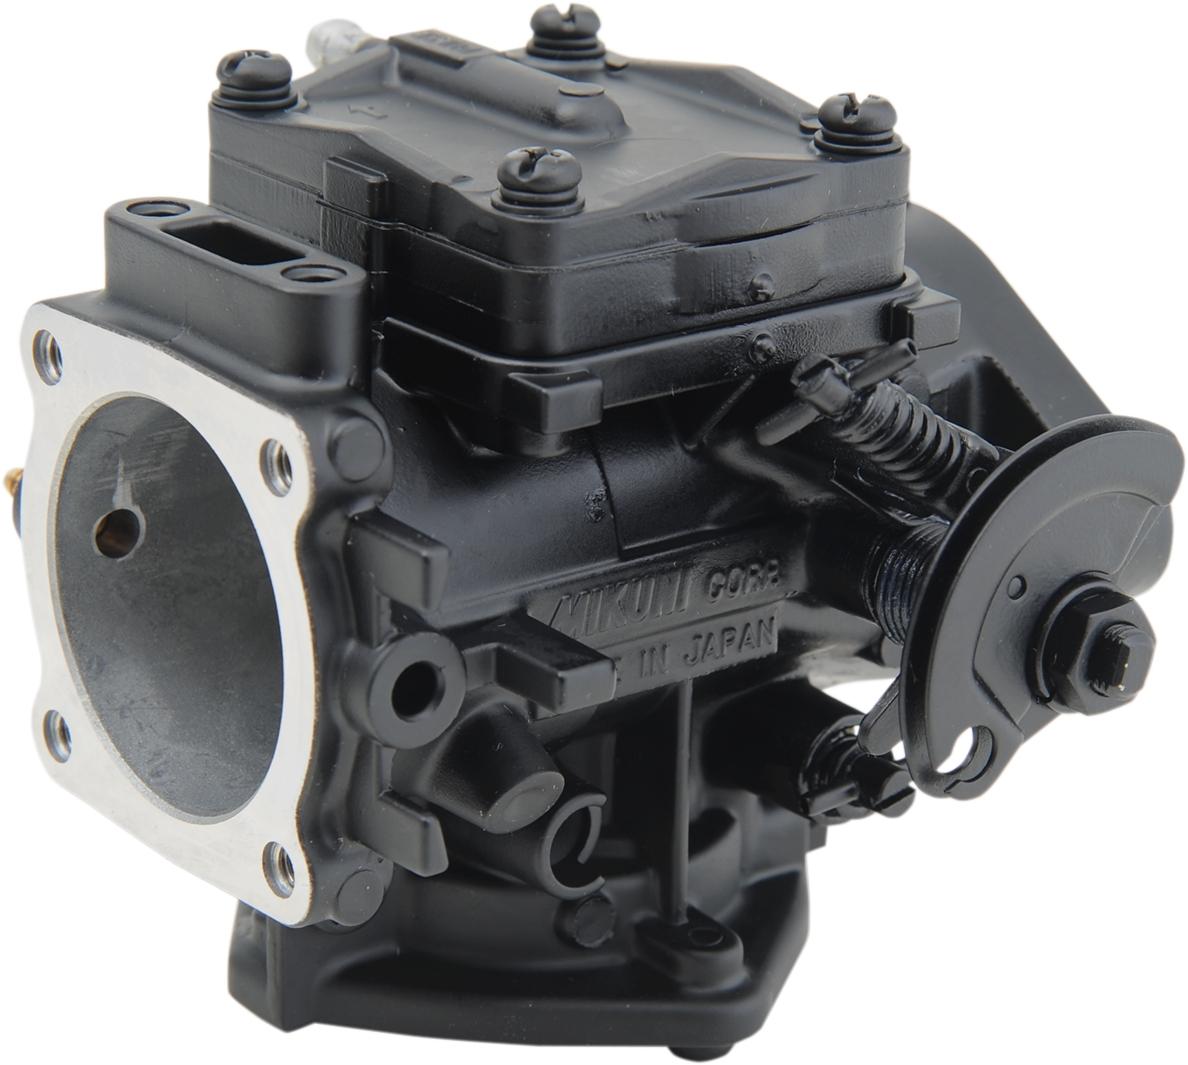 Mikuni High-Performance Super BN Series 44mm Carburetor